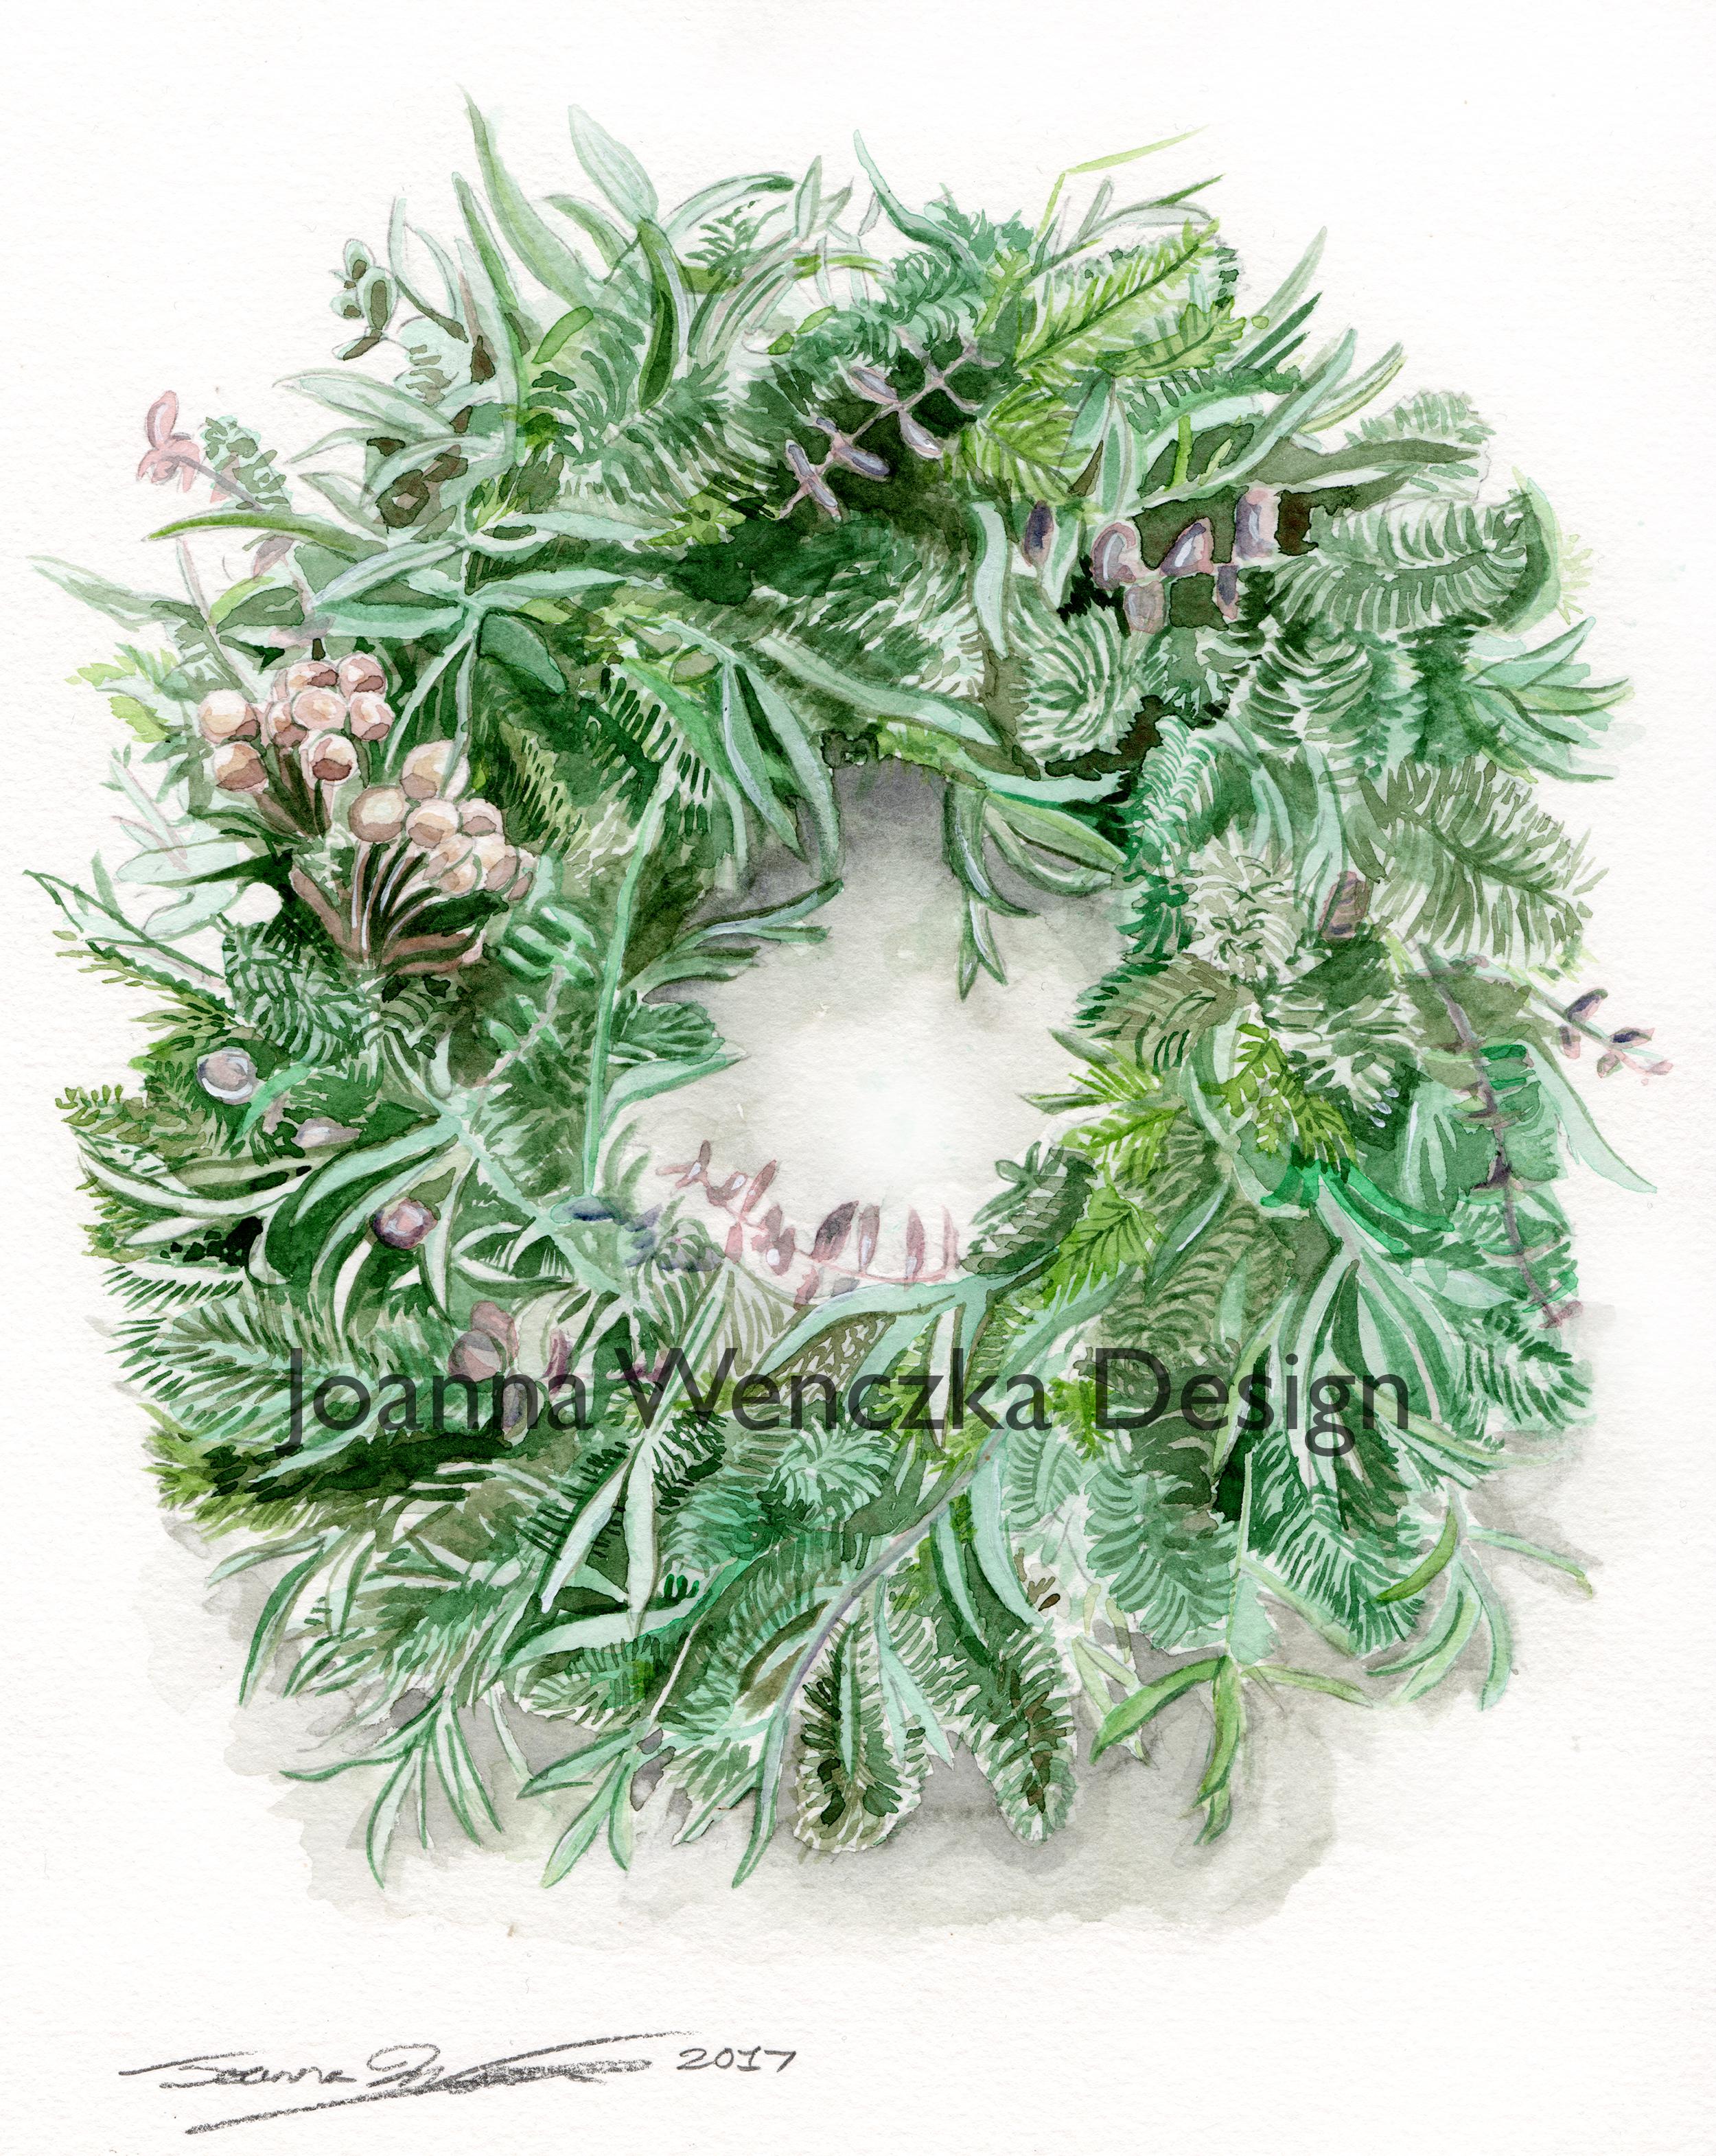 Wreath_watermarked_01.jpg